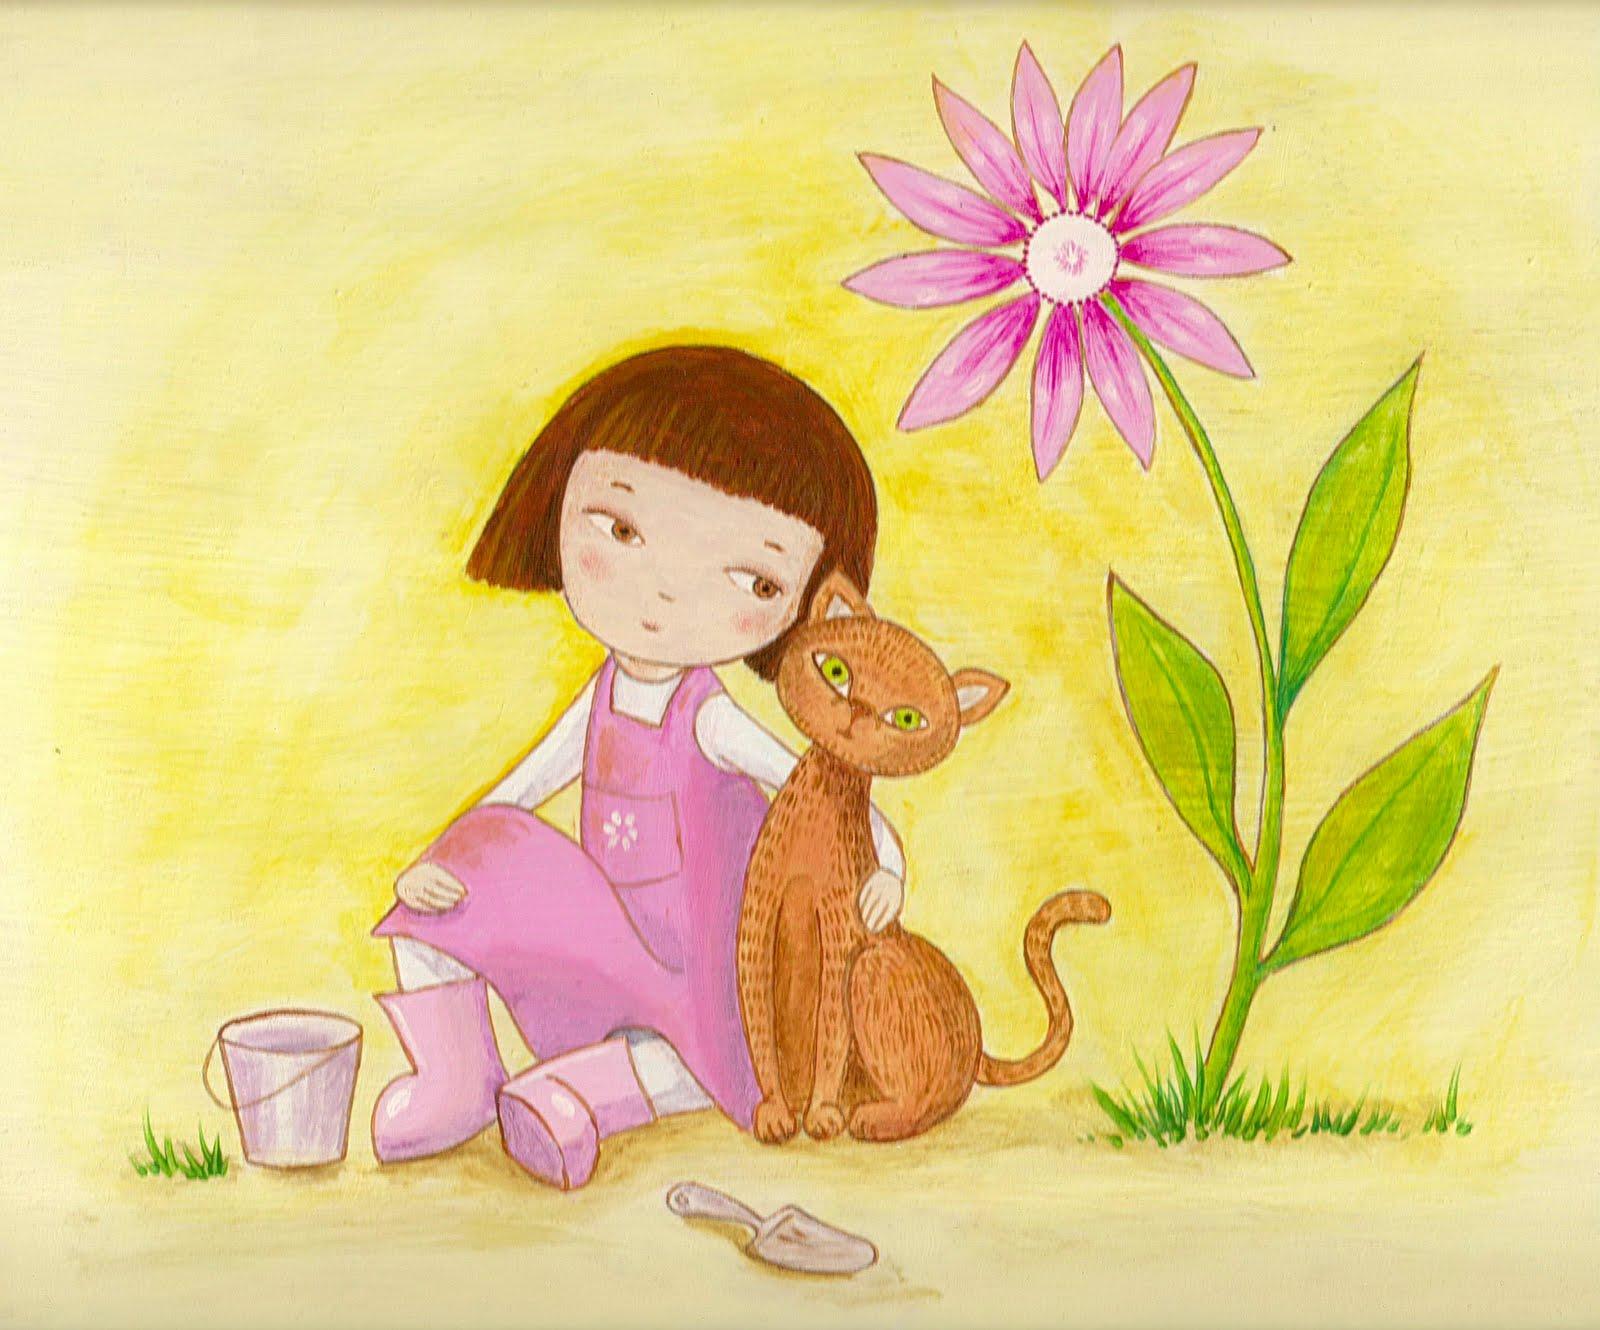 Kedibu murales y objetos decorativos cuadro infantil for Murales infantiles nina